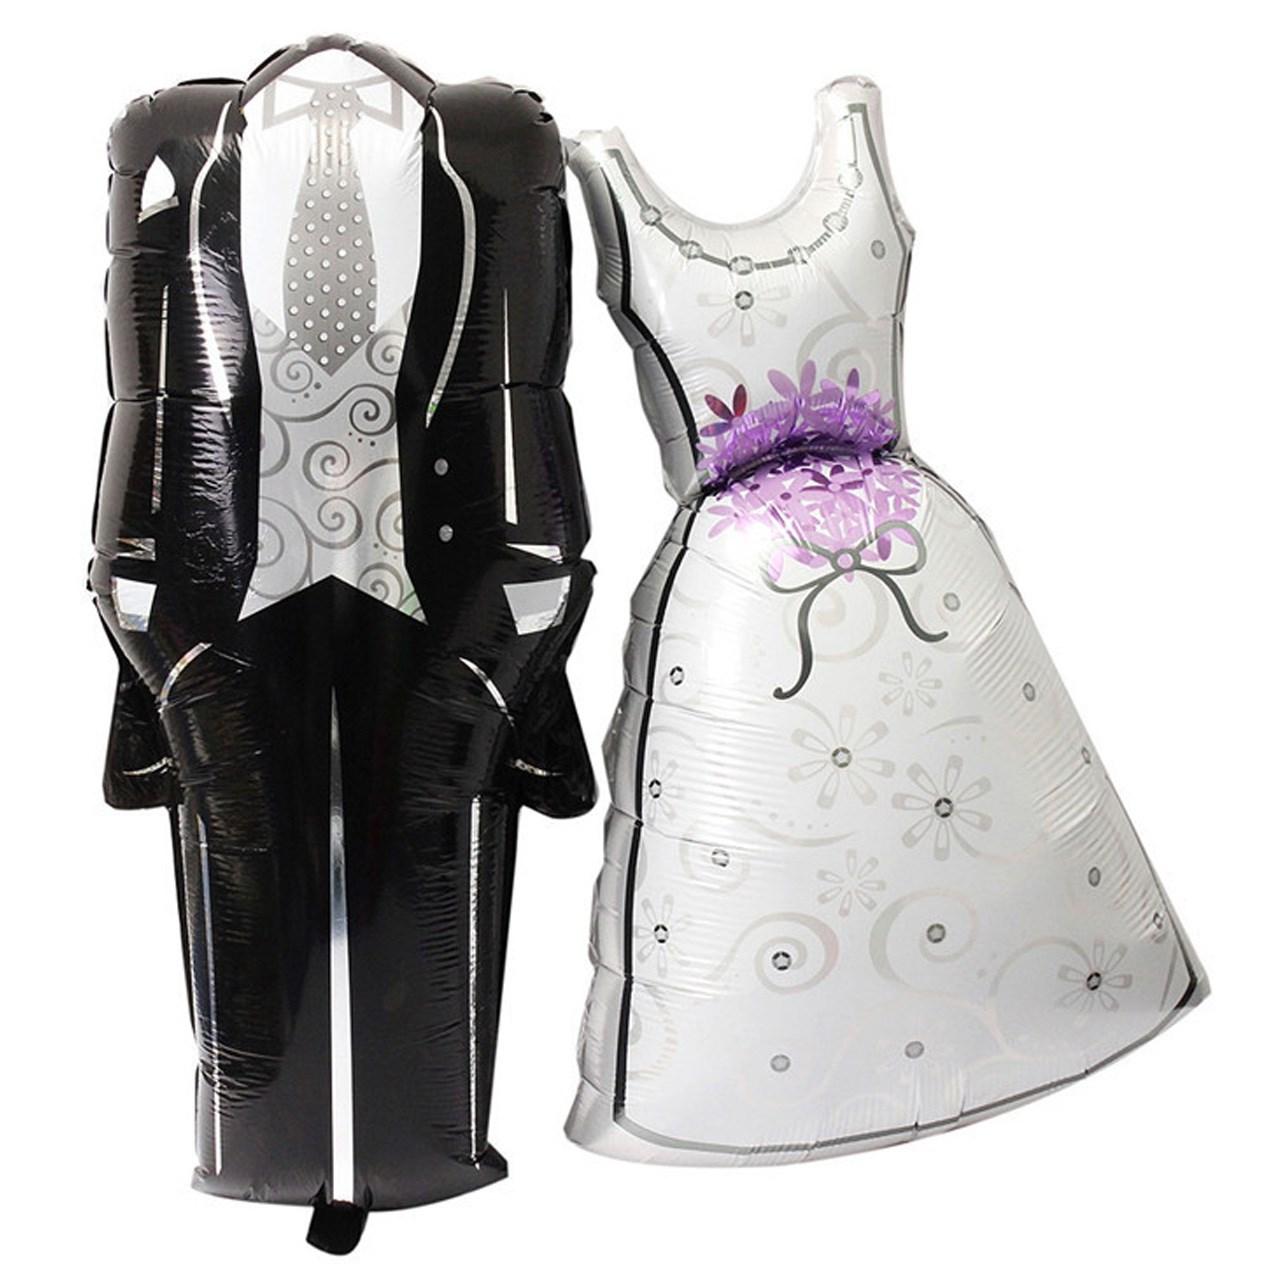 بادکنک سورتک طرح عروس و داماد مدل فویلی